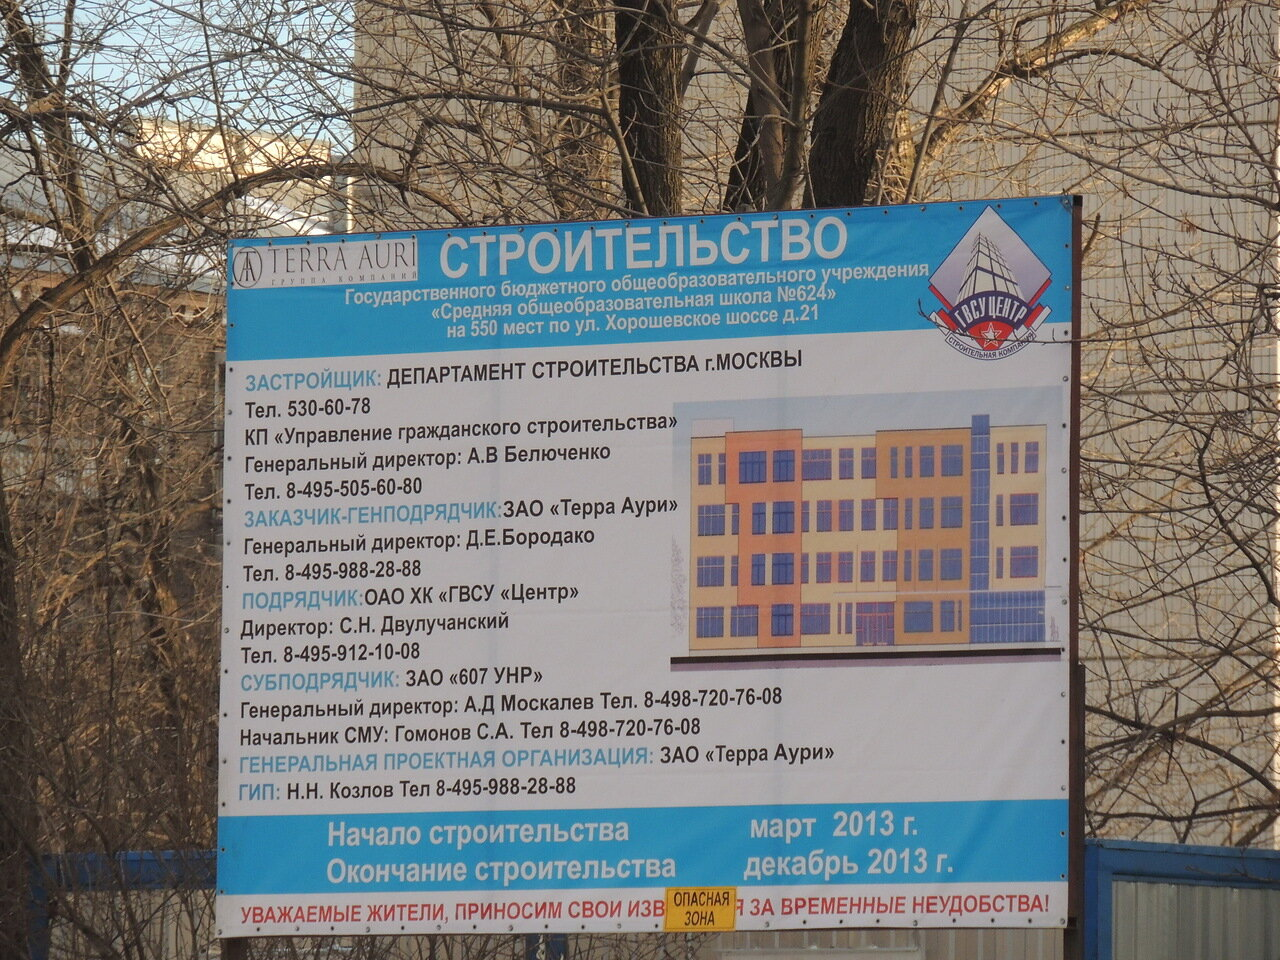 http://img-fotki.yandex.ru/get/4118/8217593.12/0_96d10_53618171_XXXL.jpg